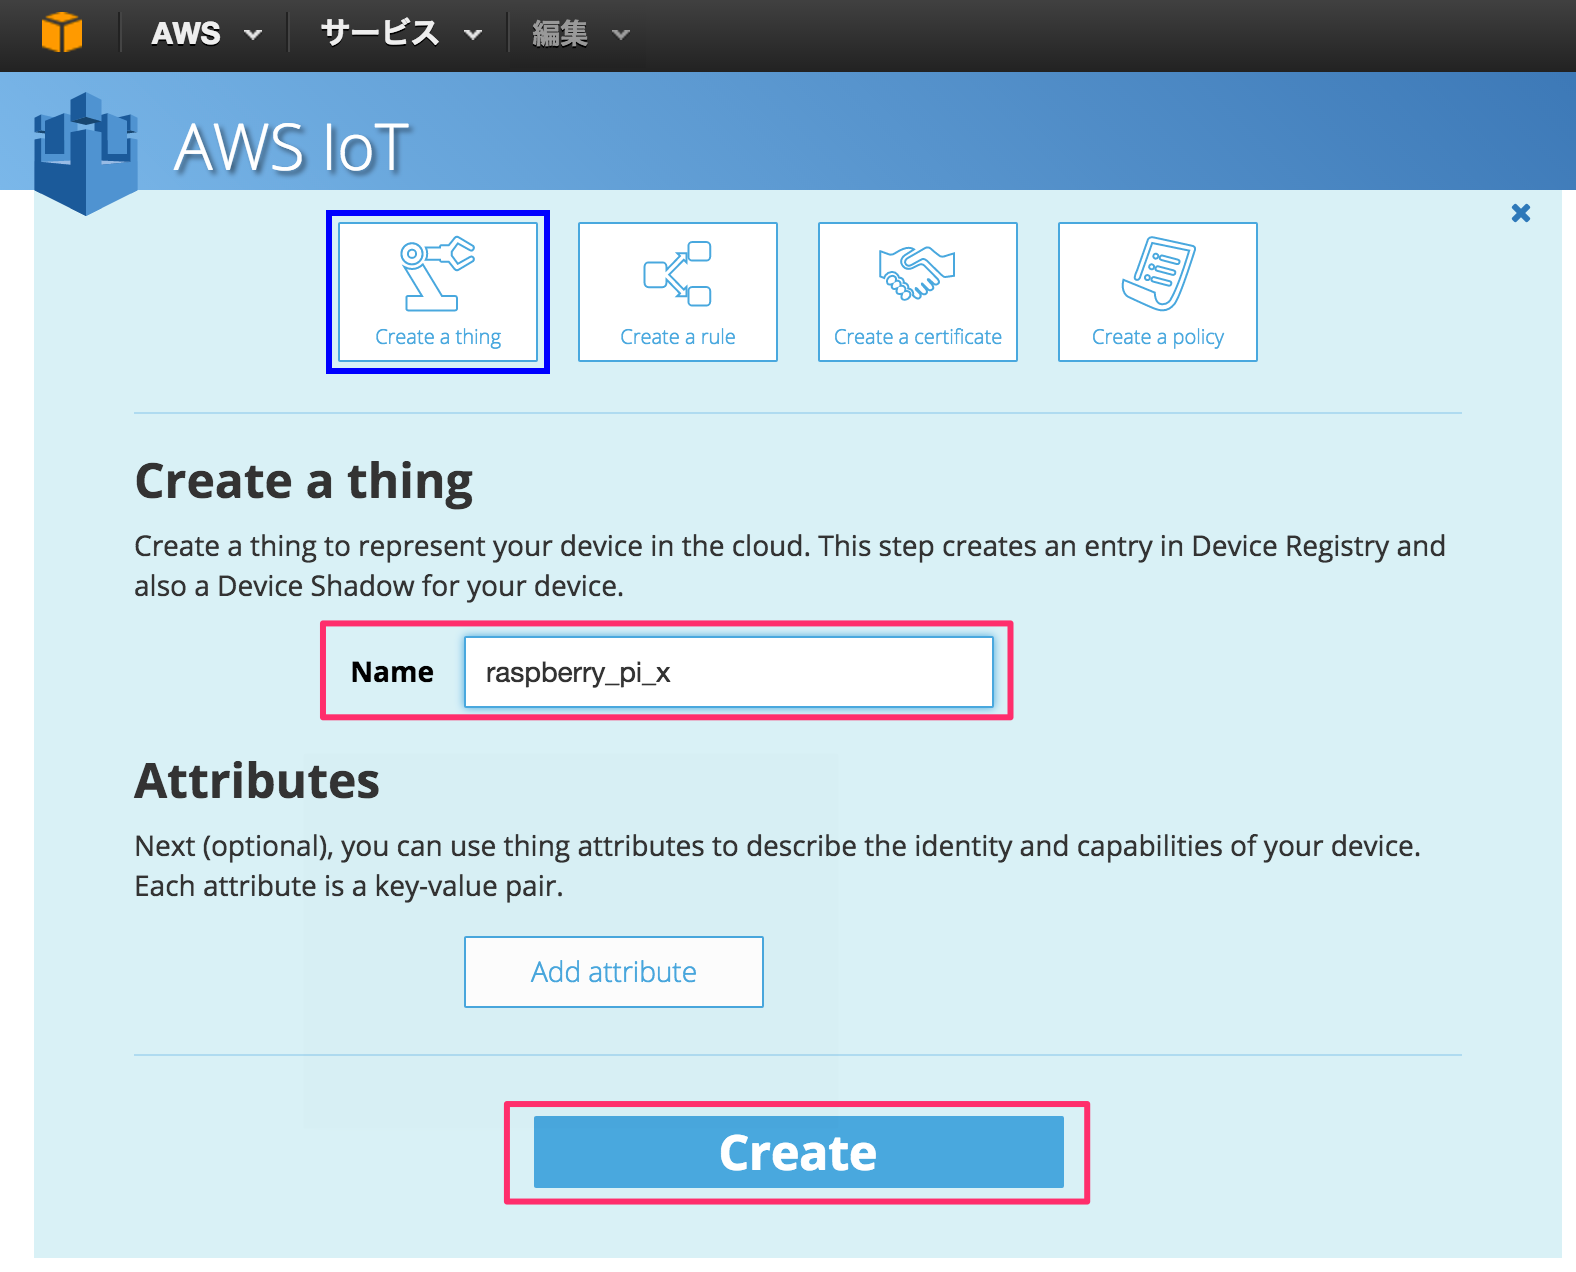 Window_と_AWS_IoT 2.png